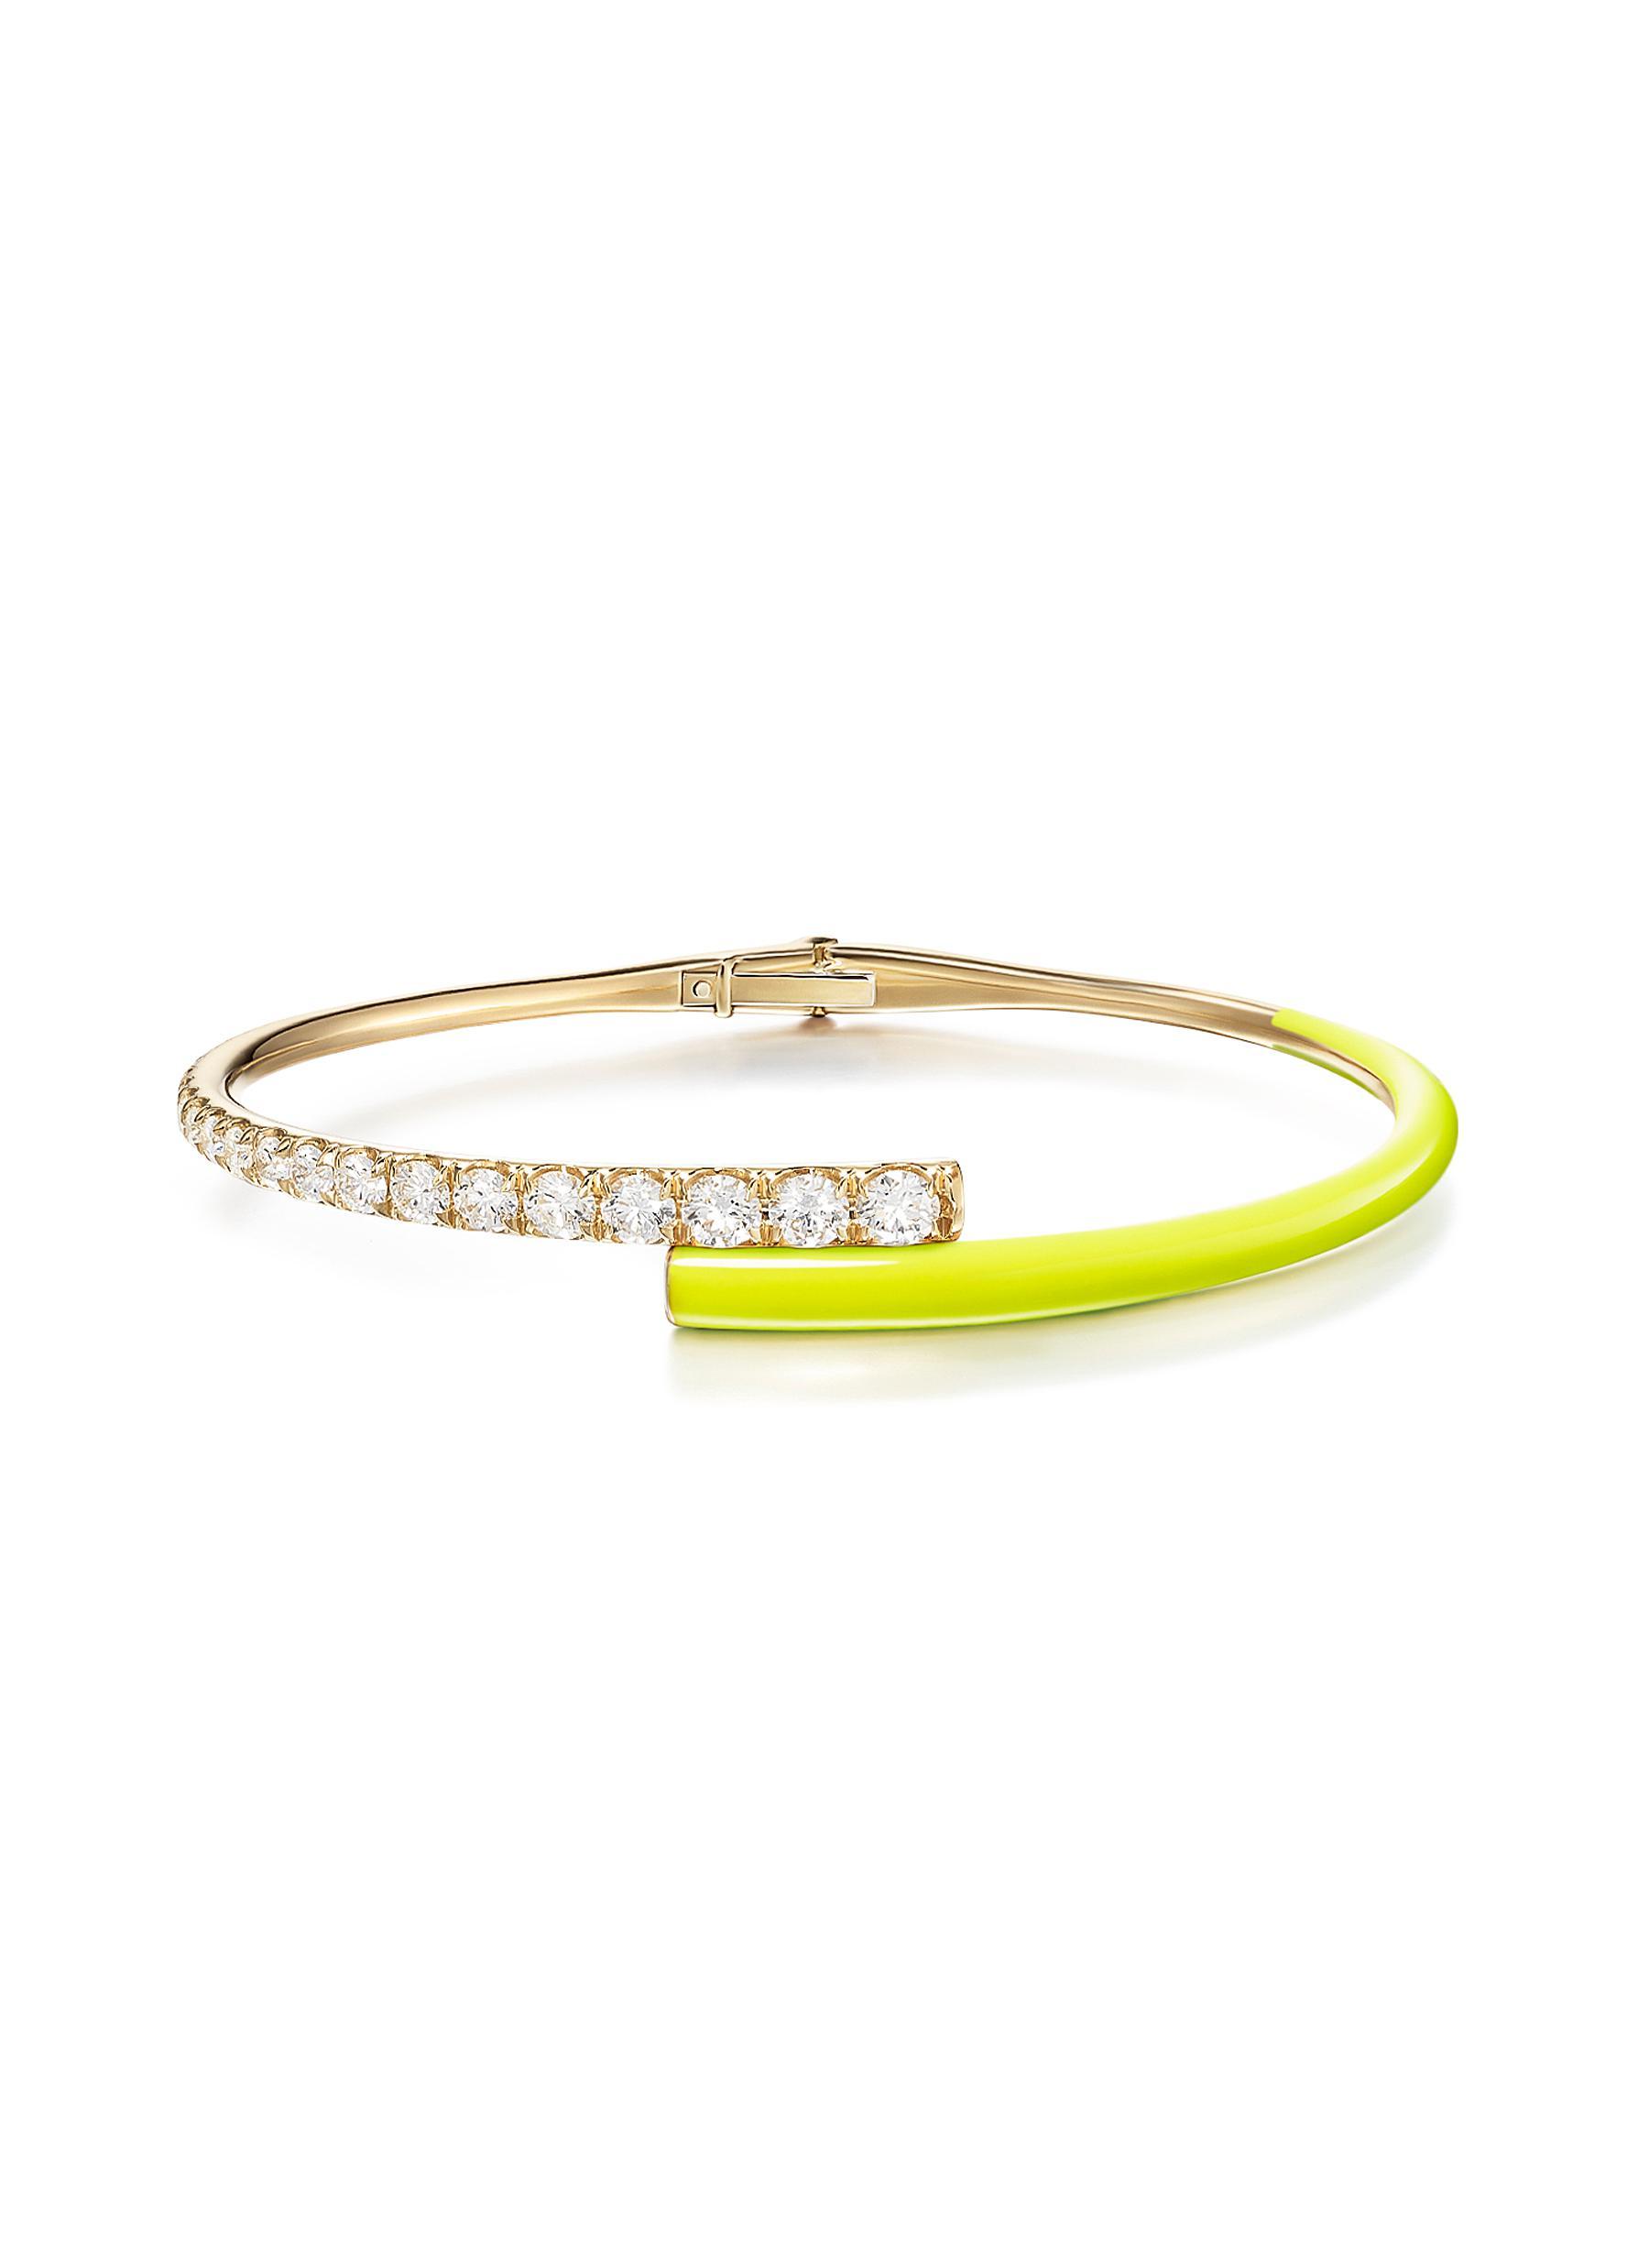 'Lola' Diamond 18k Gold Enamel Accent Bracelet